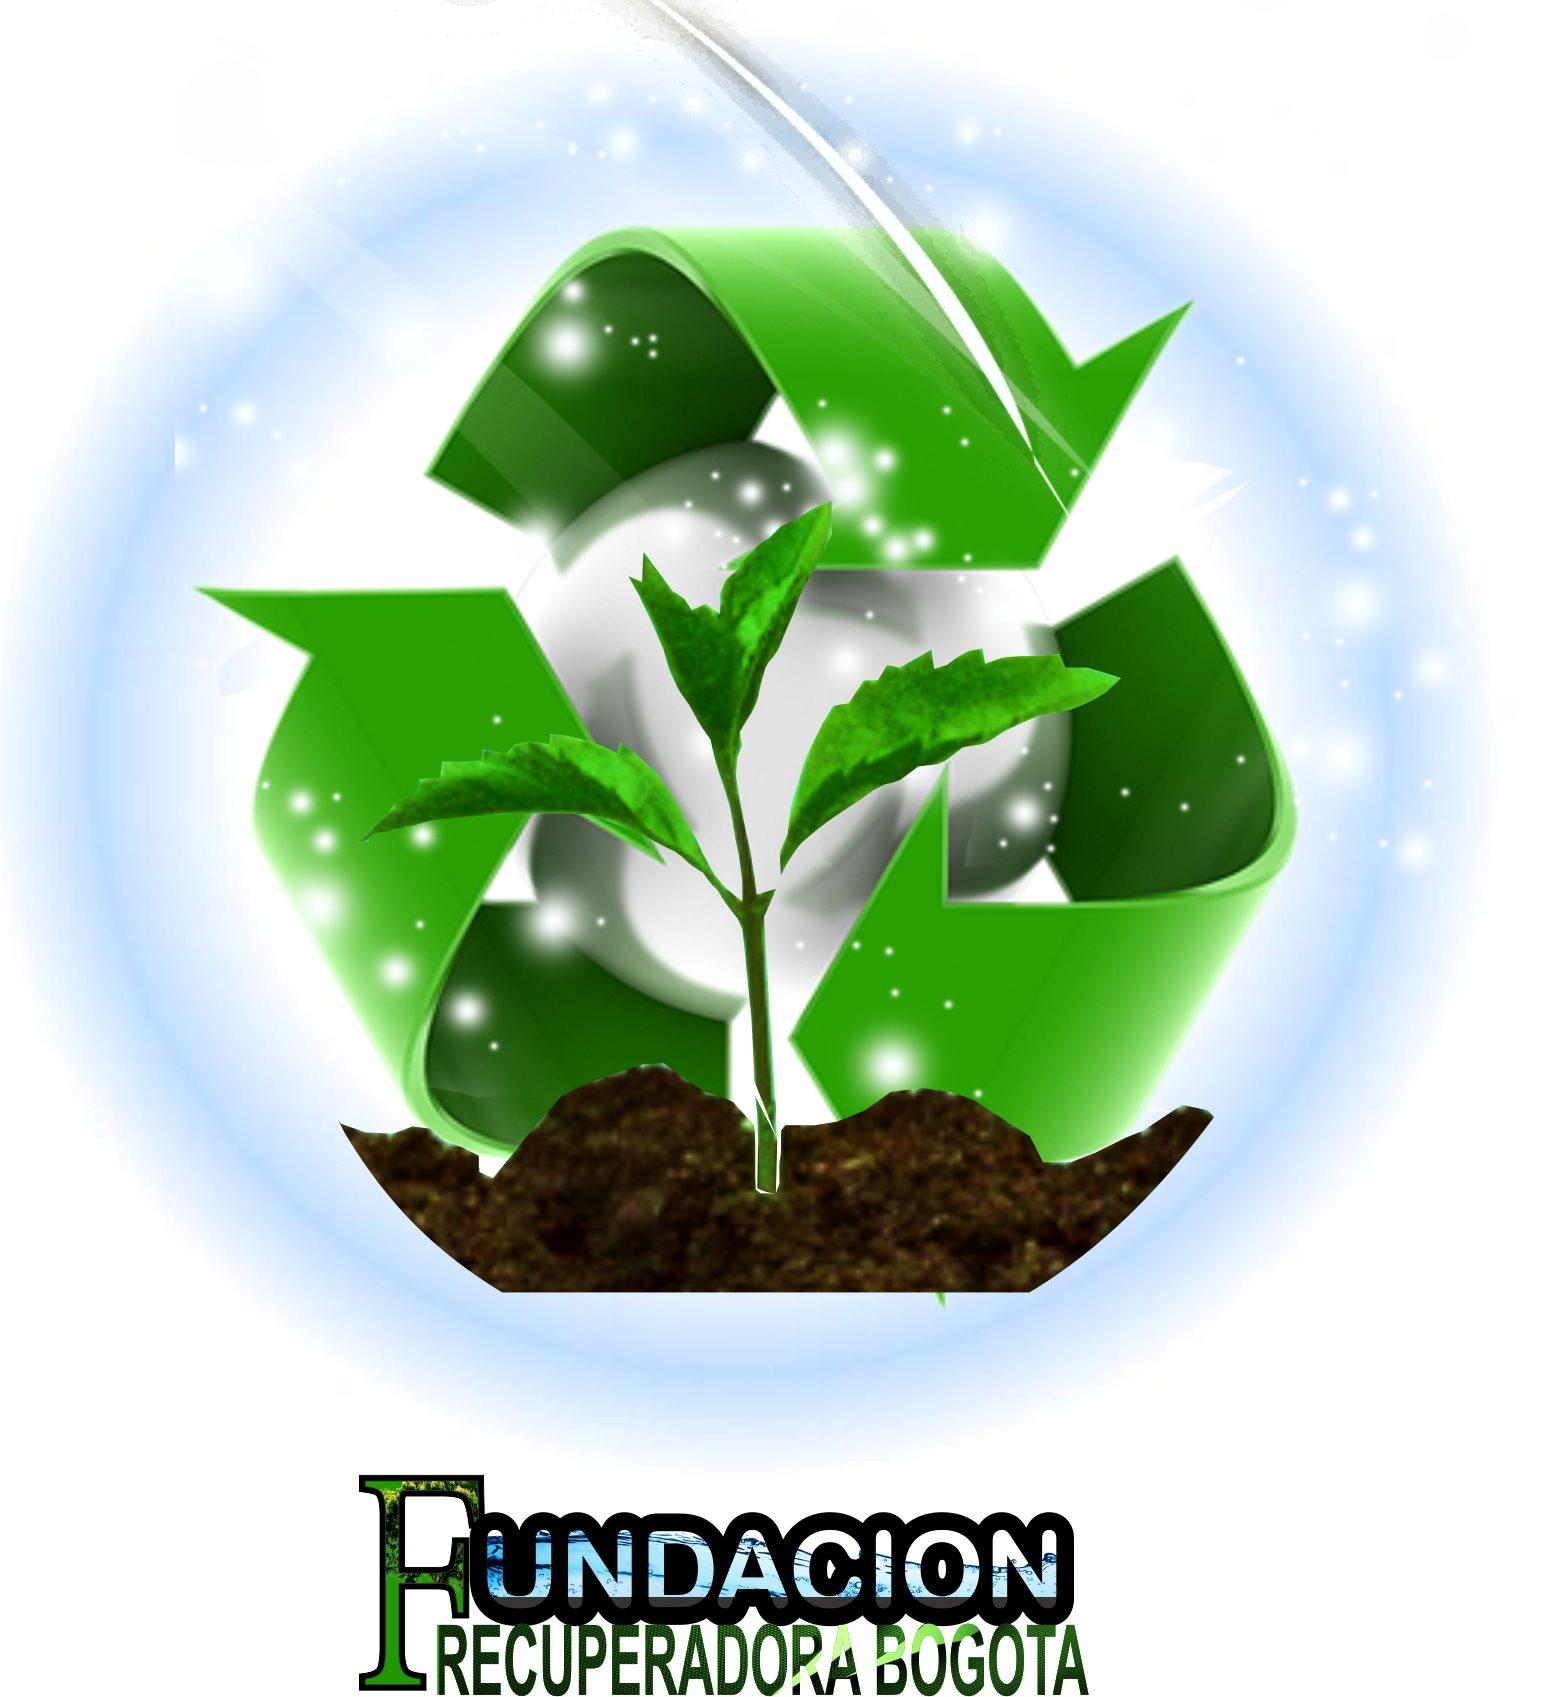 Fundacion Recuperadora Bogota